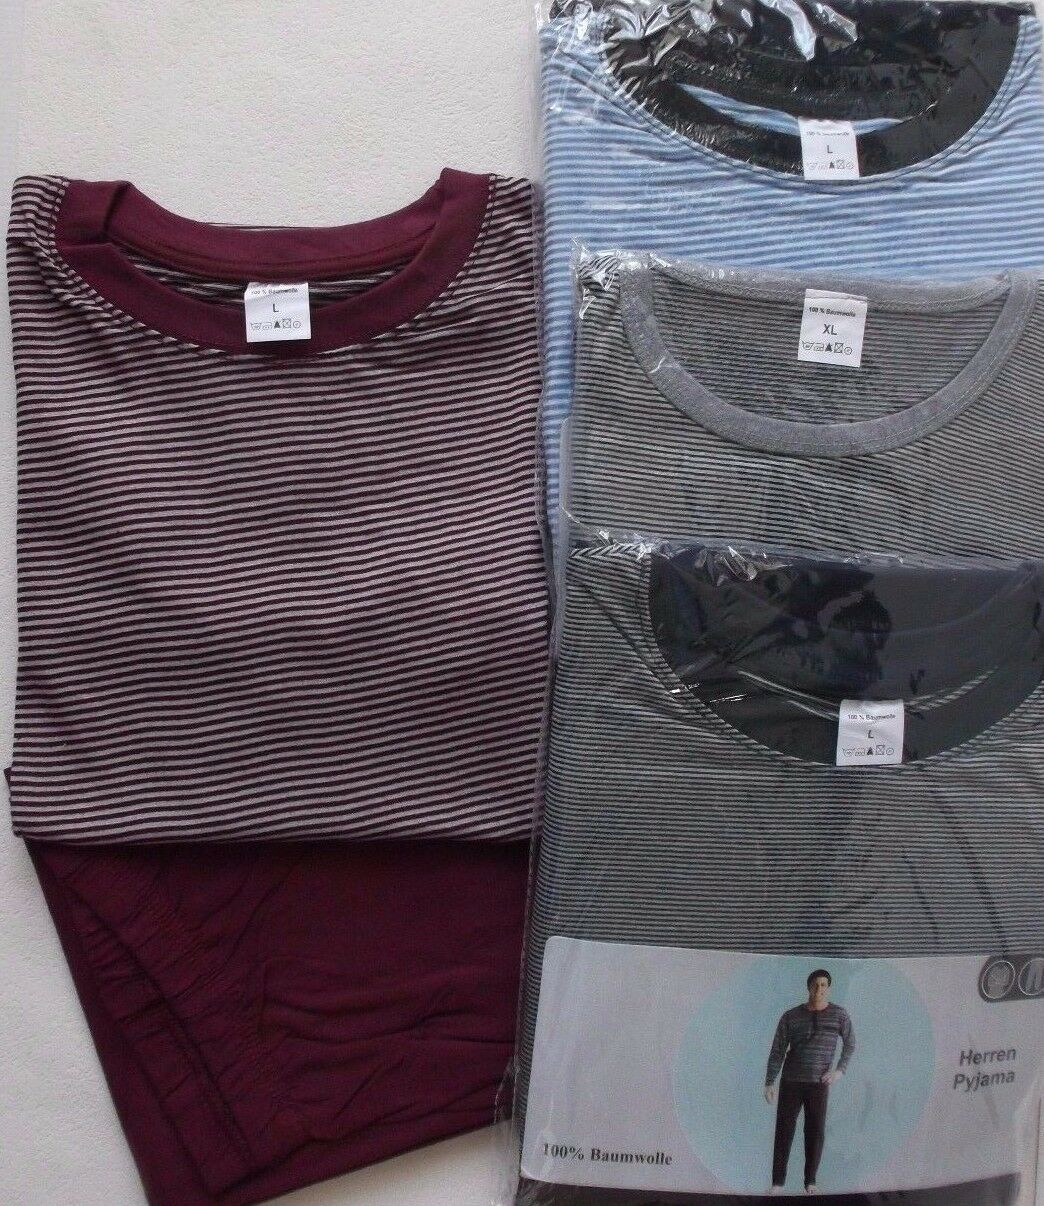 Herren Pyjama Schlafanzug Gr. M L XL  Langarm